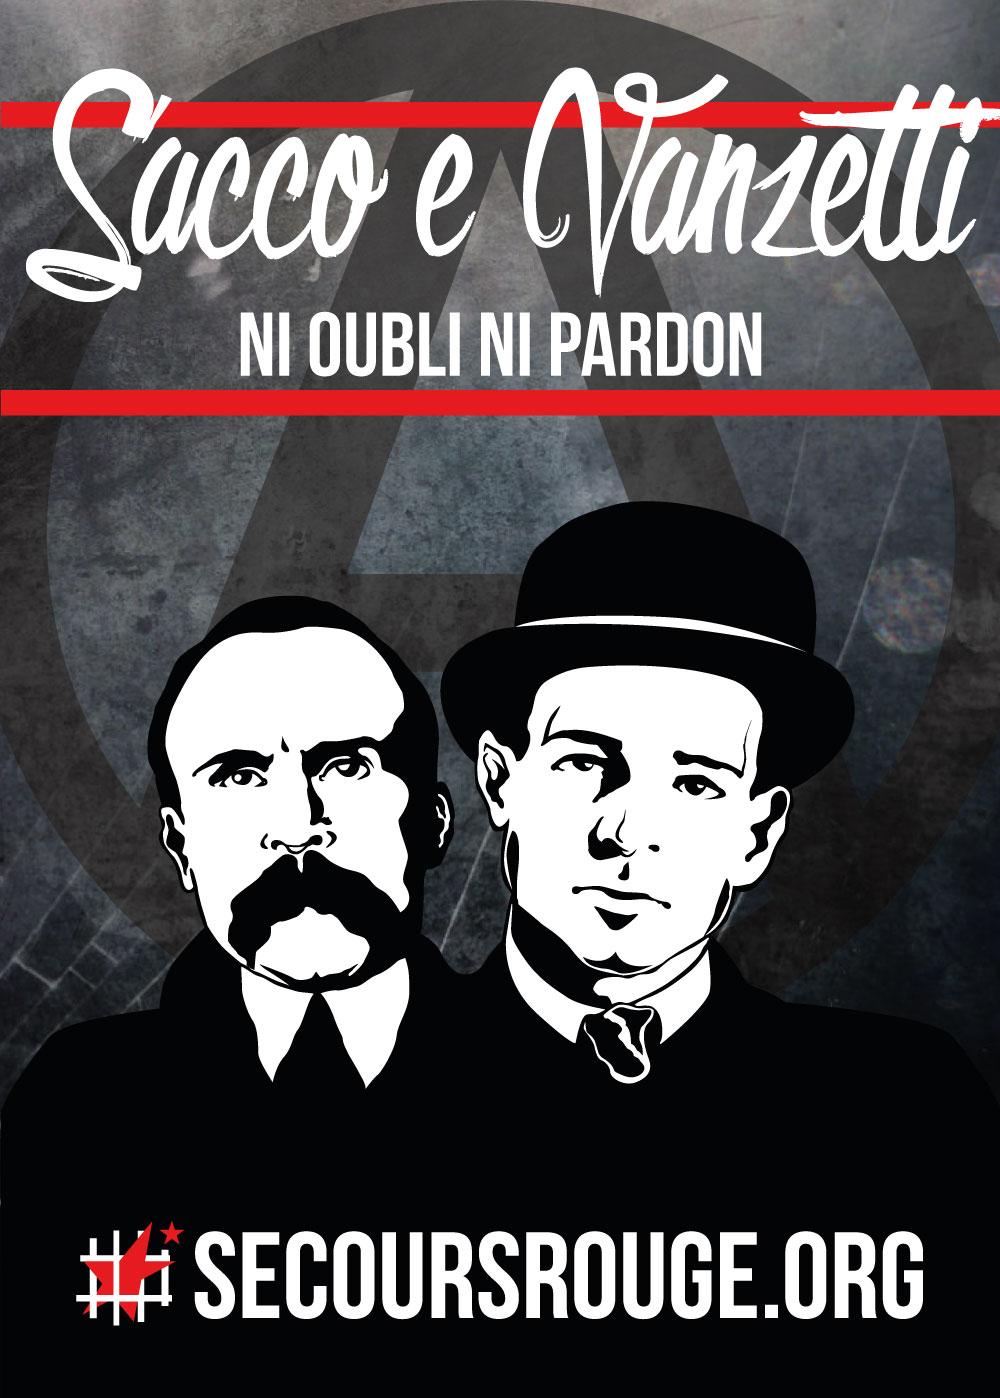 Sacco et Vanzetti, ni oubli ni pardon